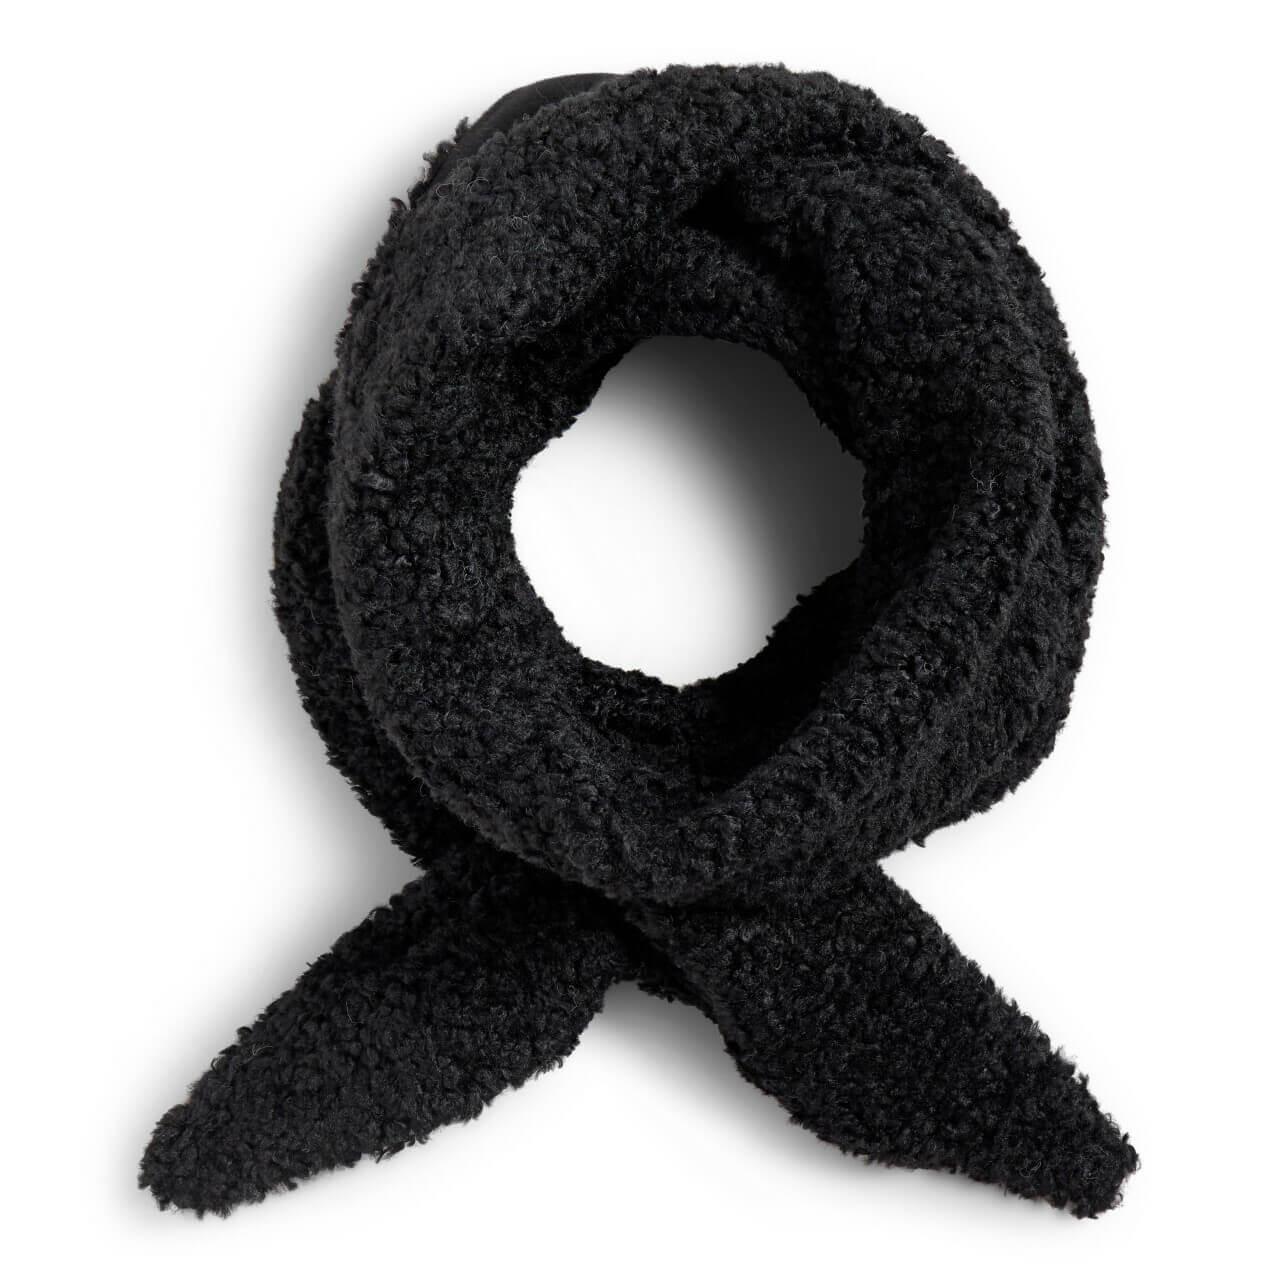 black sherpa scarf has a loophole